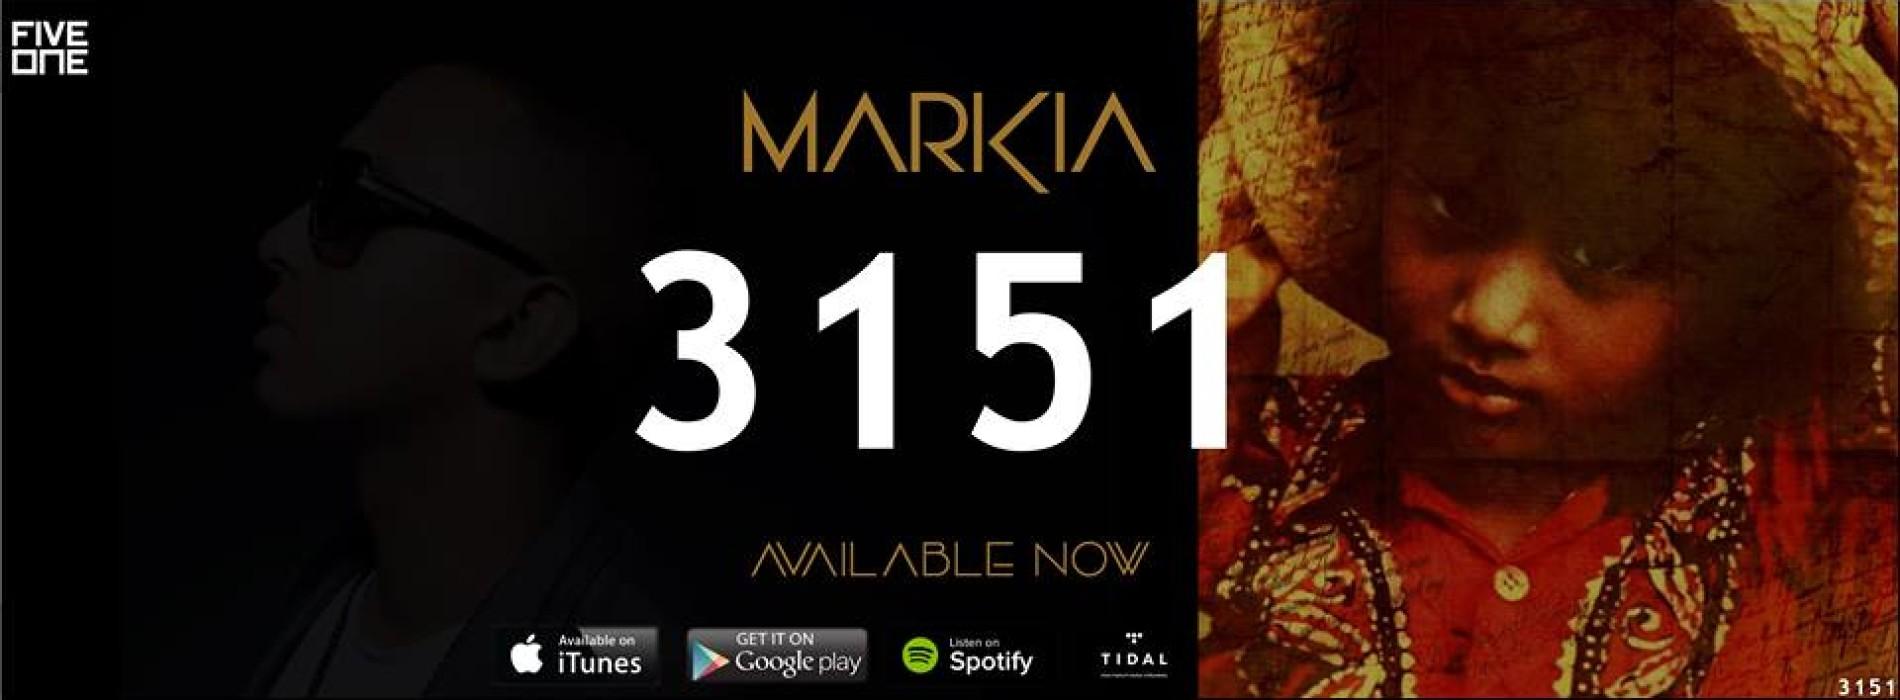 3151 By Markia